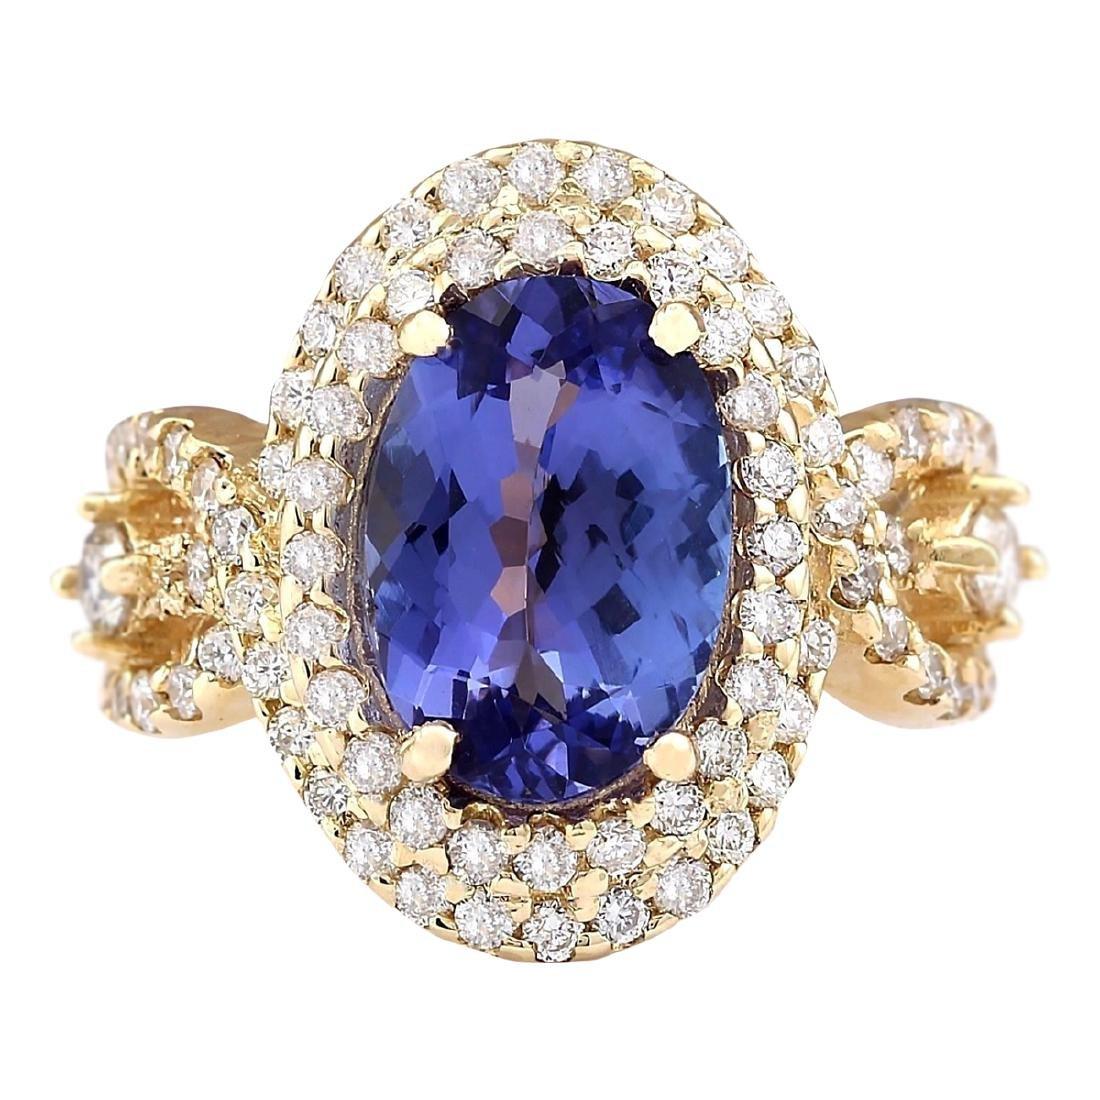 5.11 CTW Natural Tanzanite And Diamond Ring In 18K